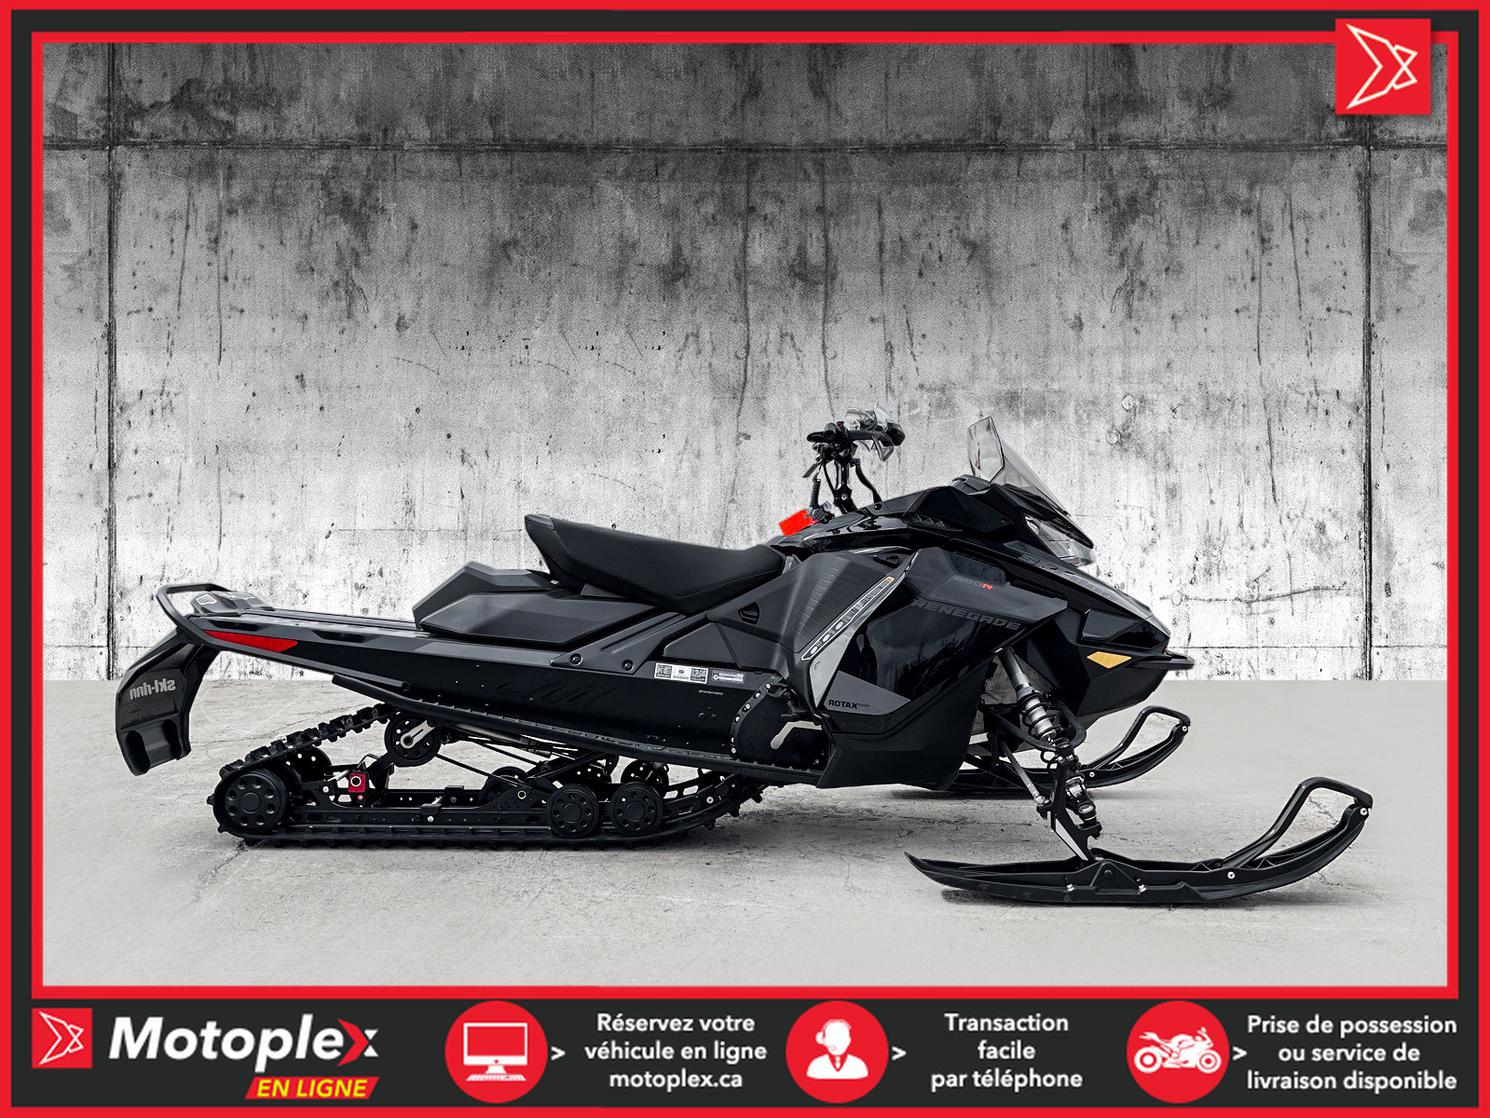 2021 Ski-Doo RENEGADE ADRENALINE  600 E-TEC - 39$/SEMAINE